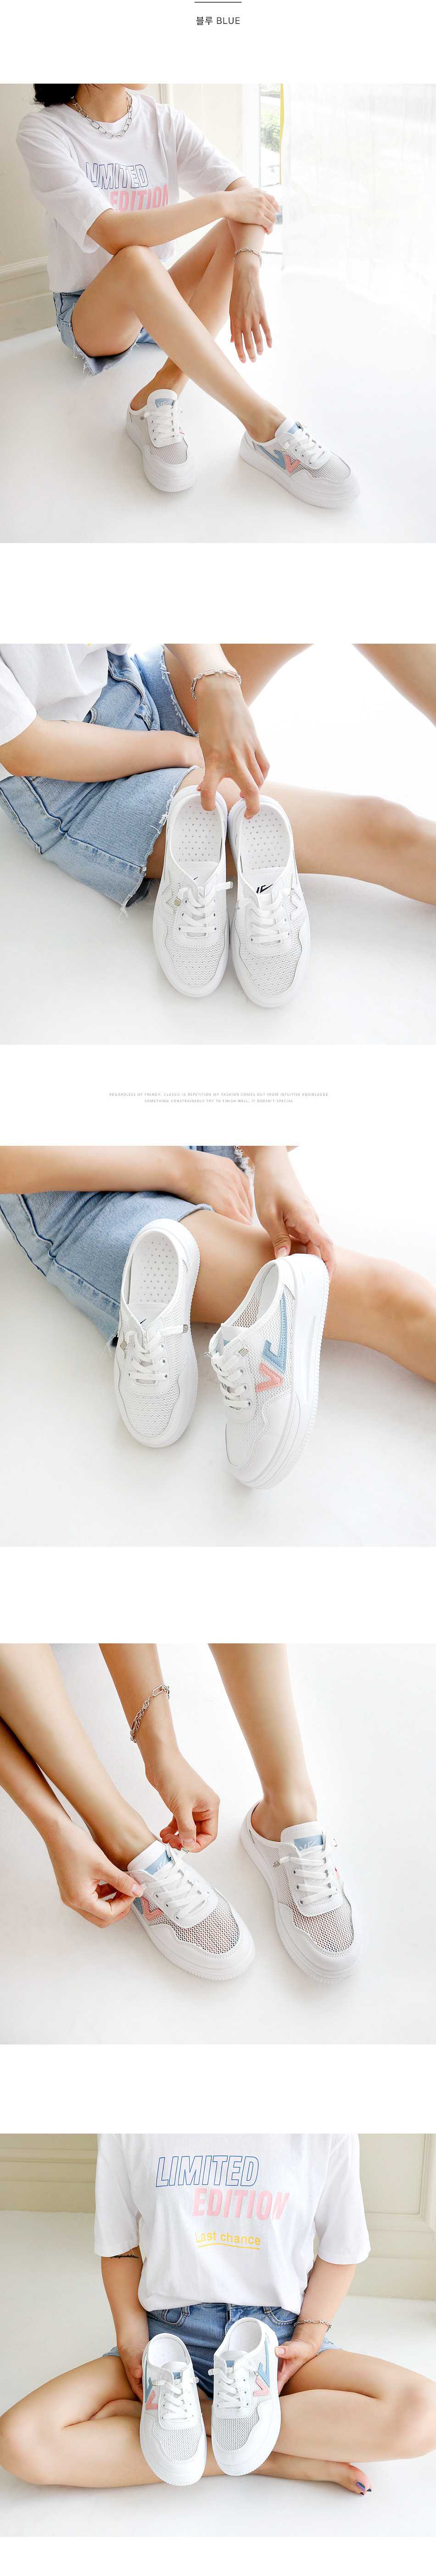 My Zune Mesh Sneakers Blower 4cm